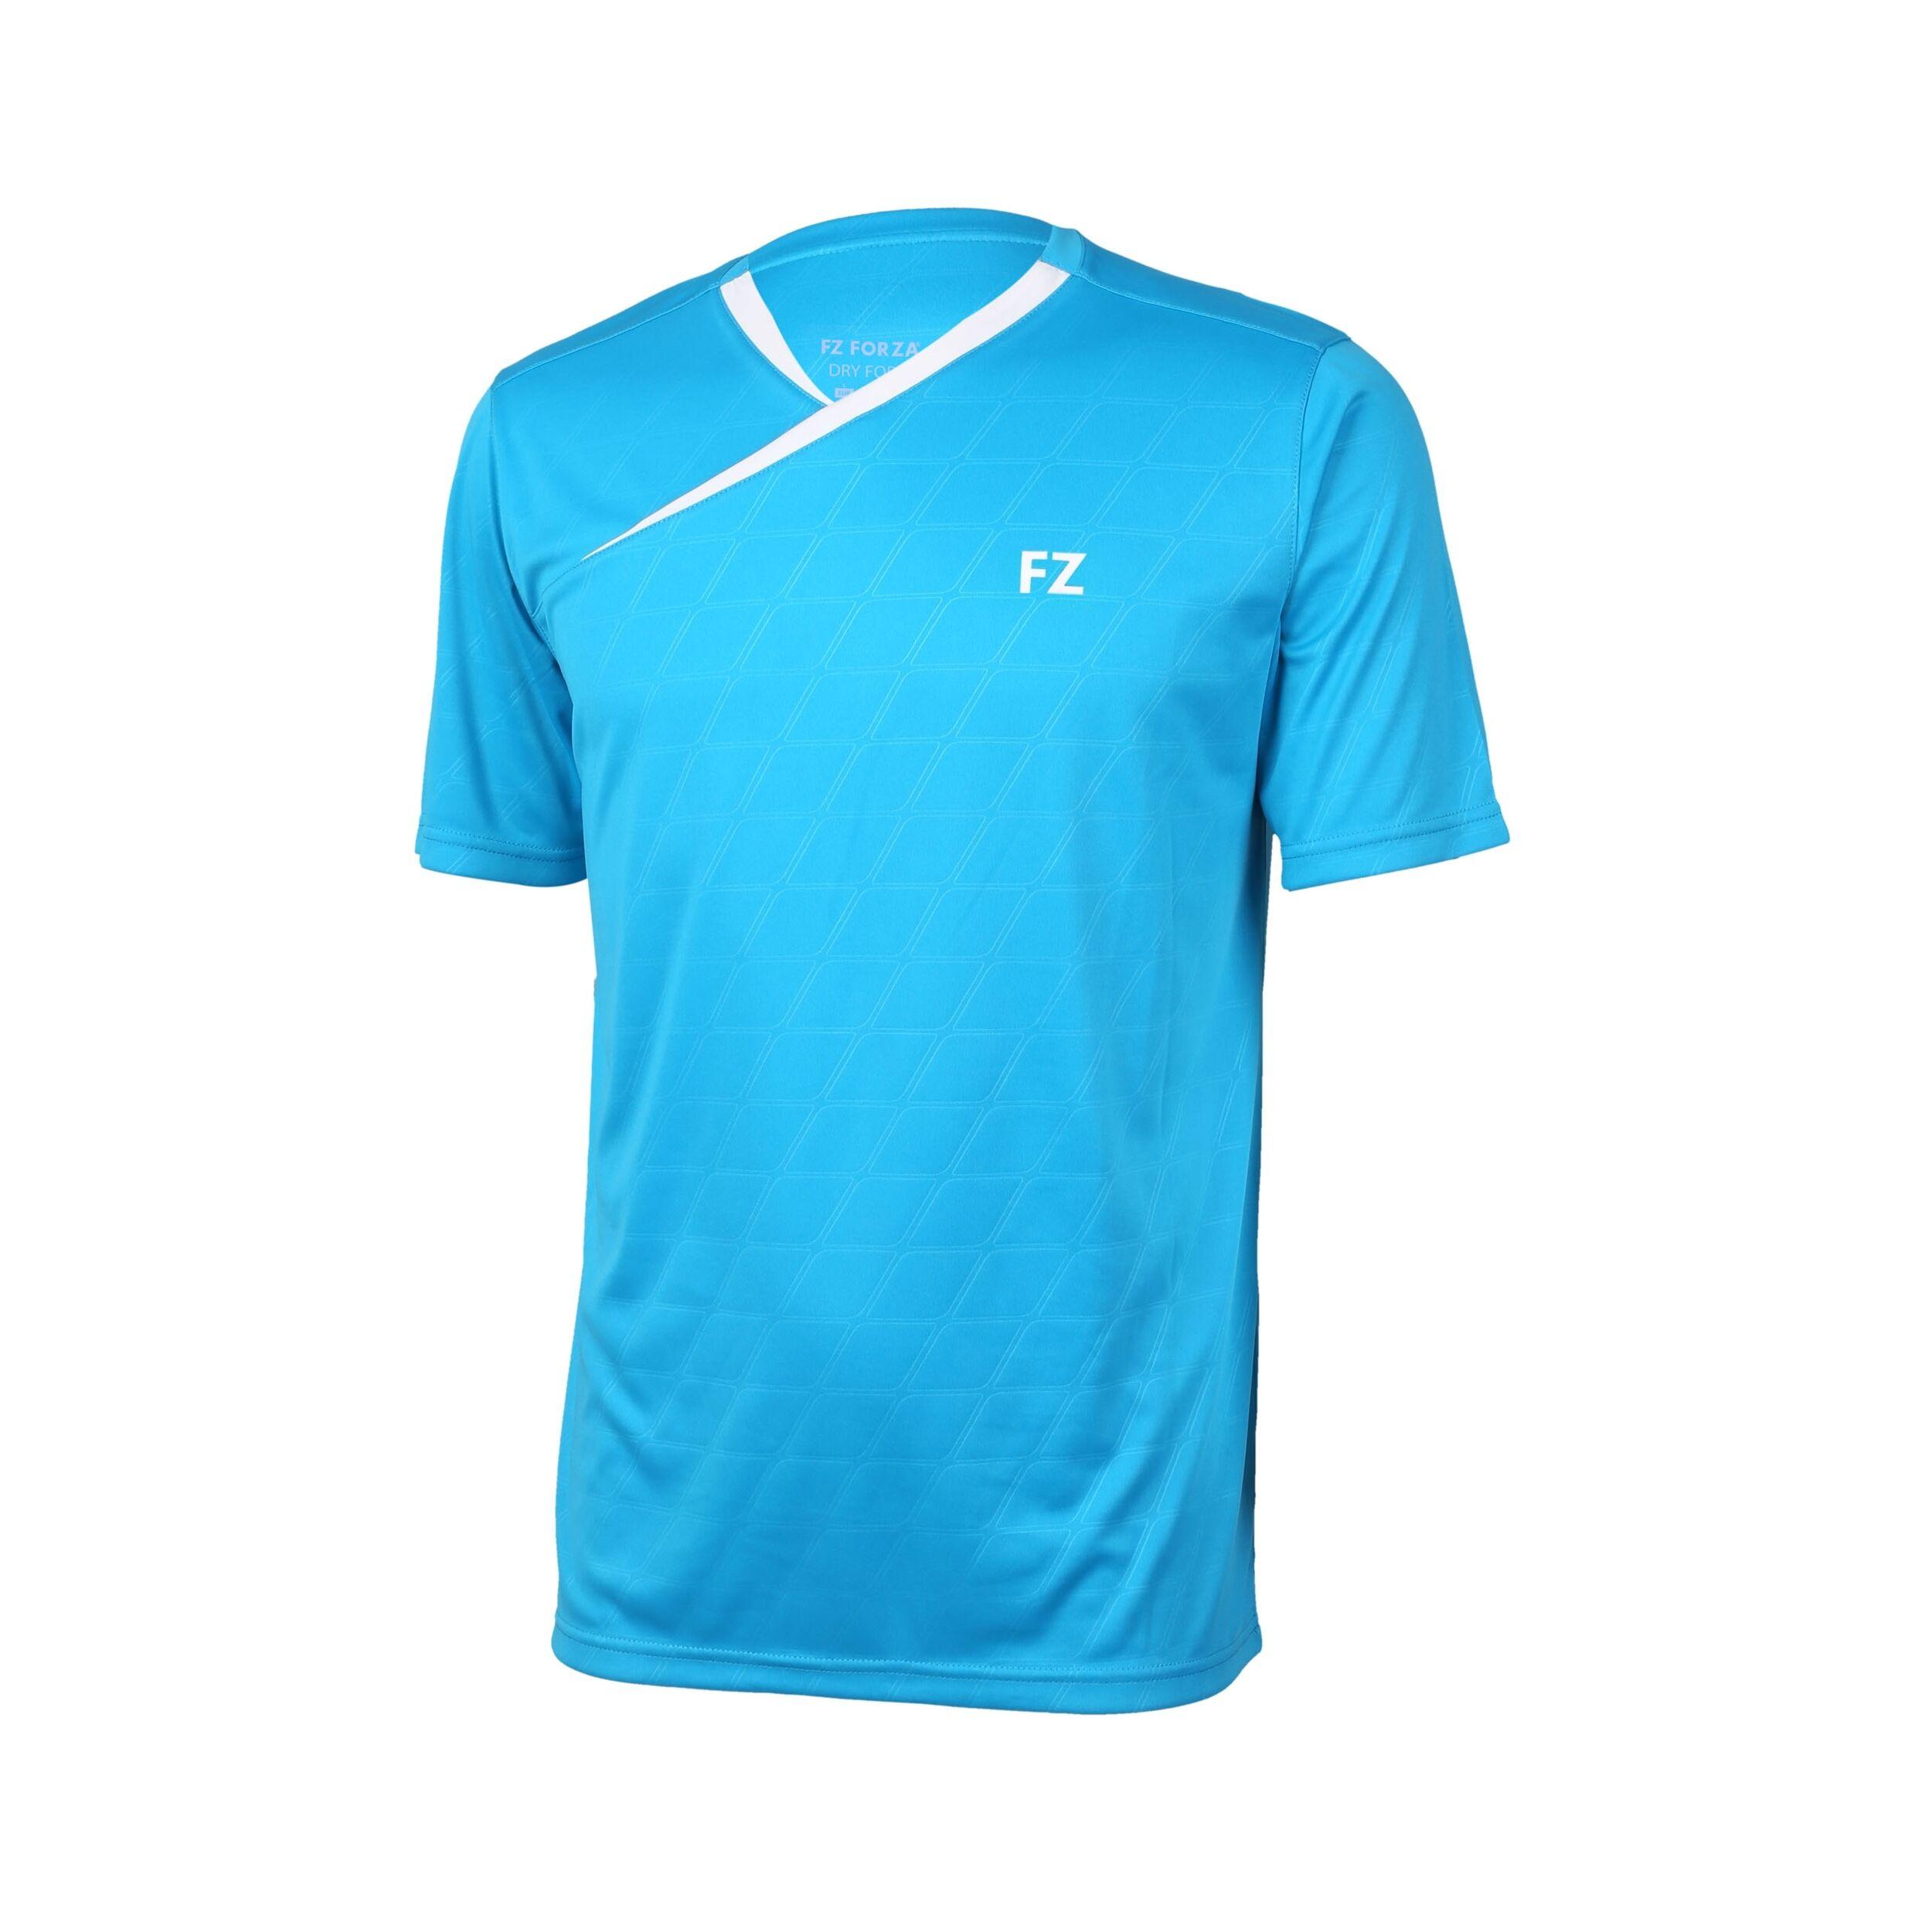 FZ Forza Byron T-shirt Junior Atomic Teal 164